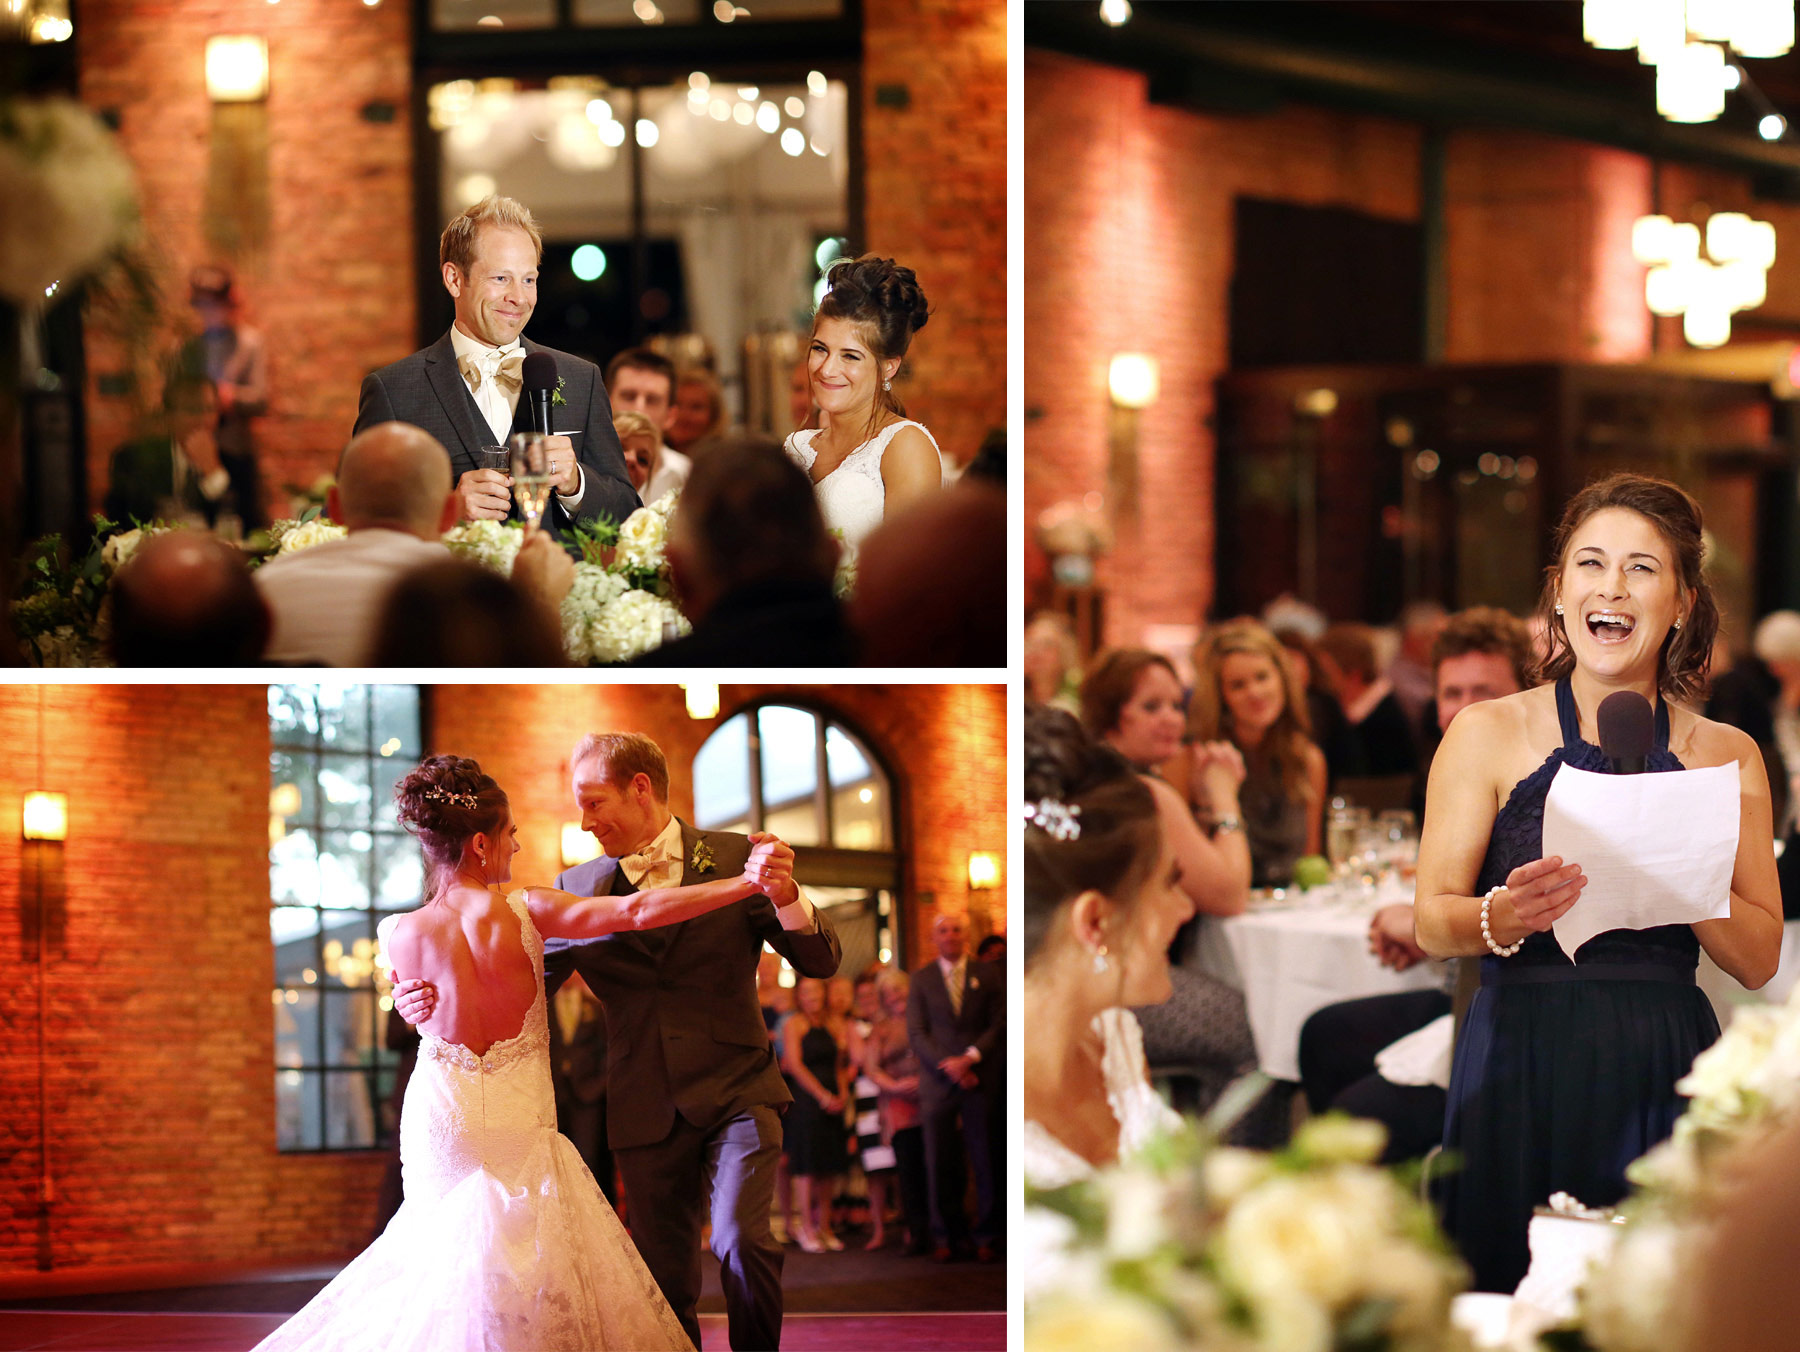 24-Minneapolis-Minnesota-Wedding-Photographer-by-Andrew-Vick-Photography-Fall-Autumn-Nicollet-Island-Pavillion-Bride-Groom-Speeches-Bridesmaid-Dance-Paula-and-Jason.jpg